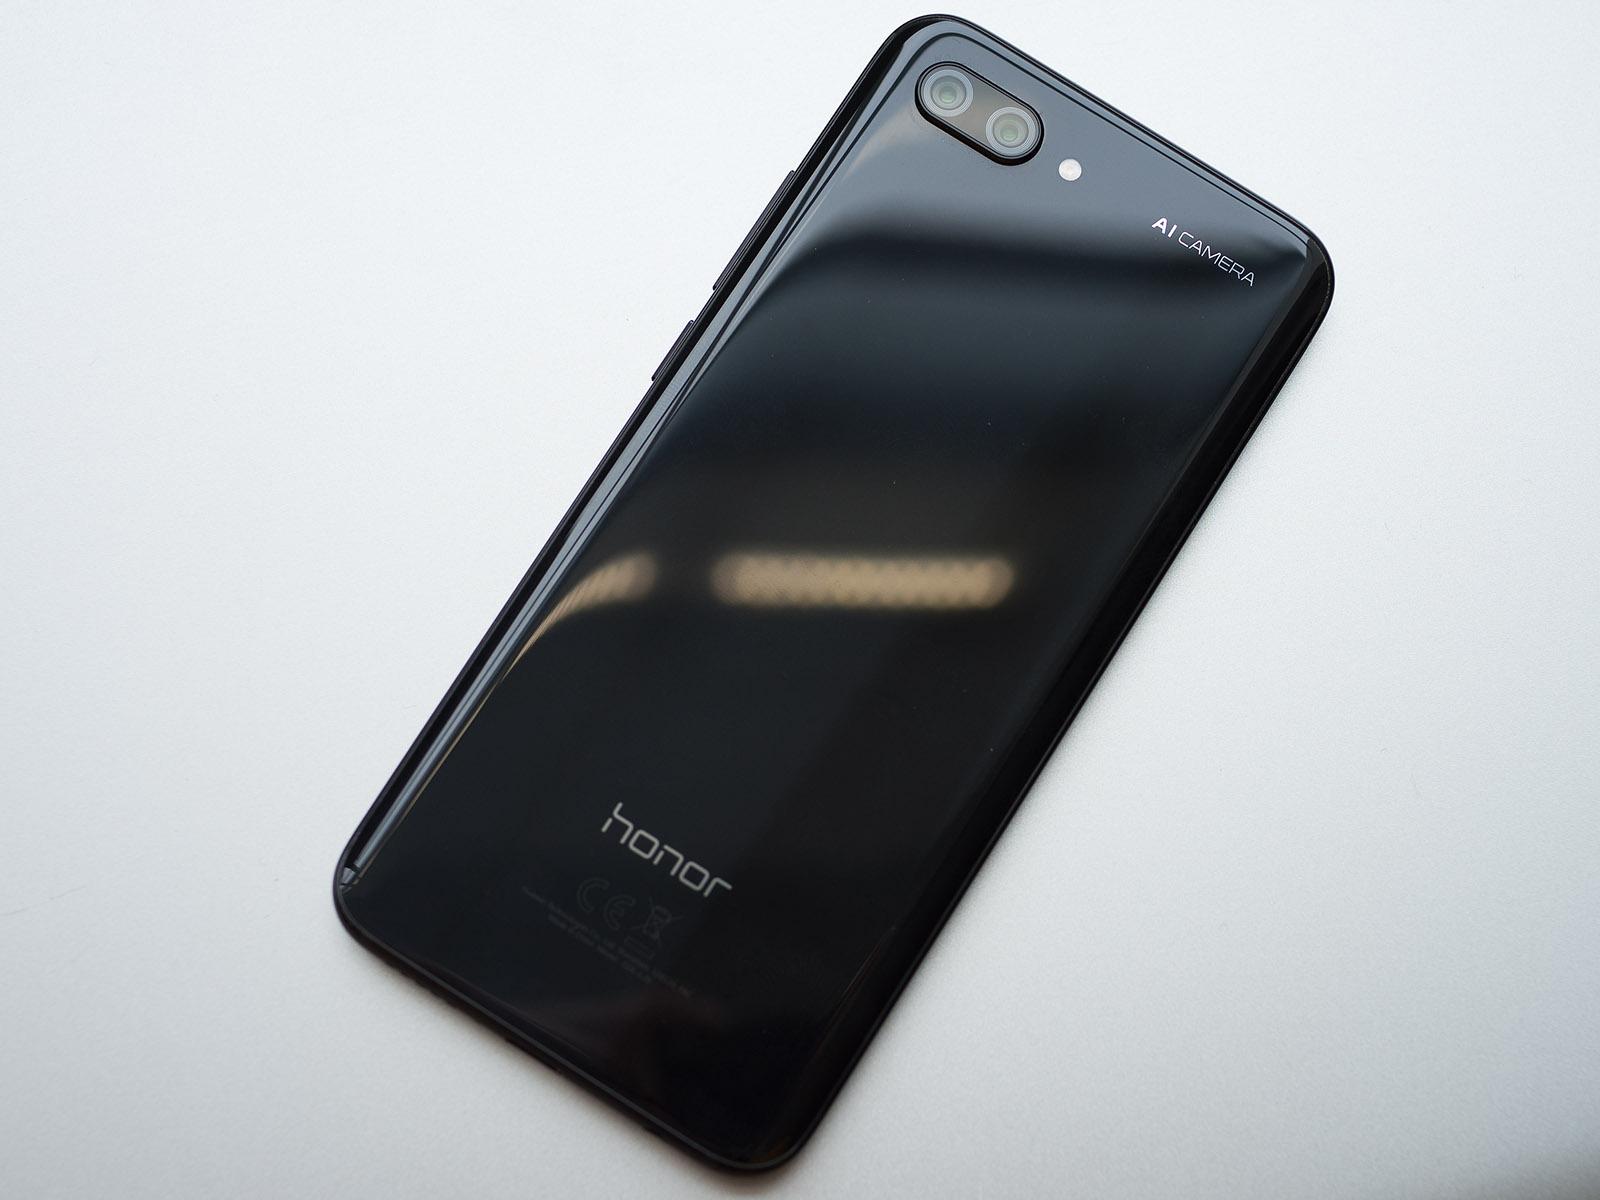 Как фотографирует новый Honor 10. Сравниваем с Huawei P20 и iPhone 7 Plus - 3